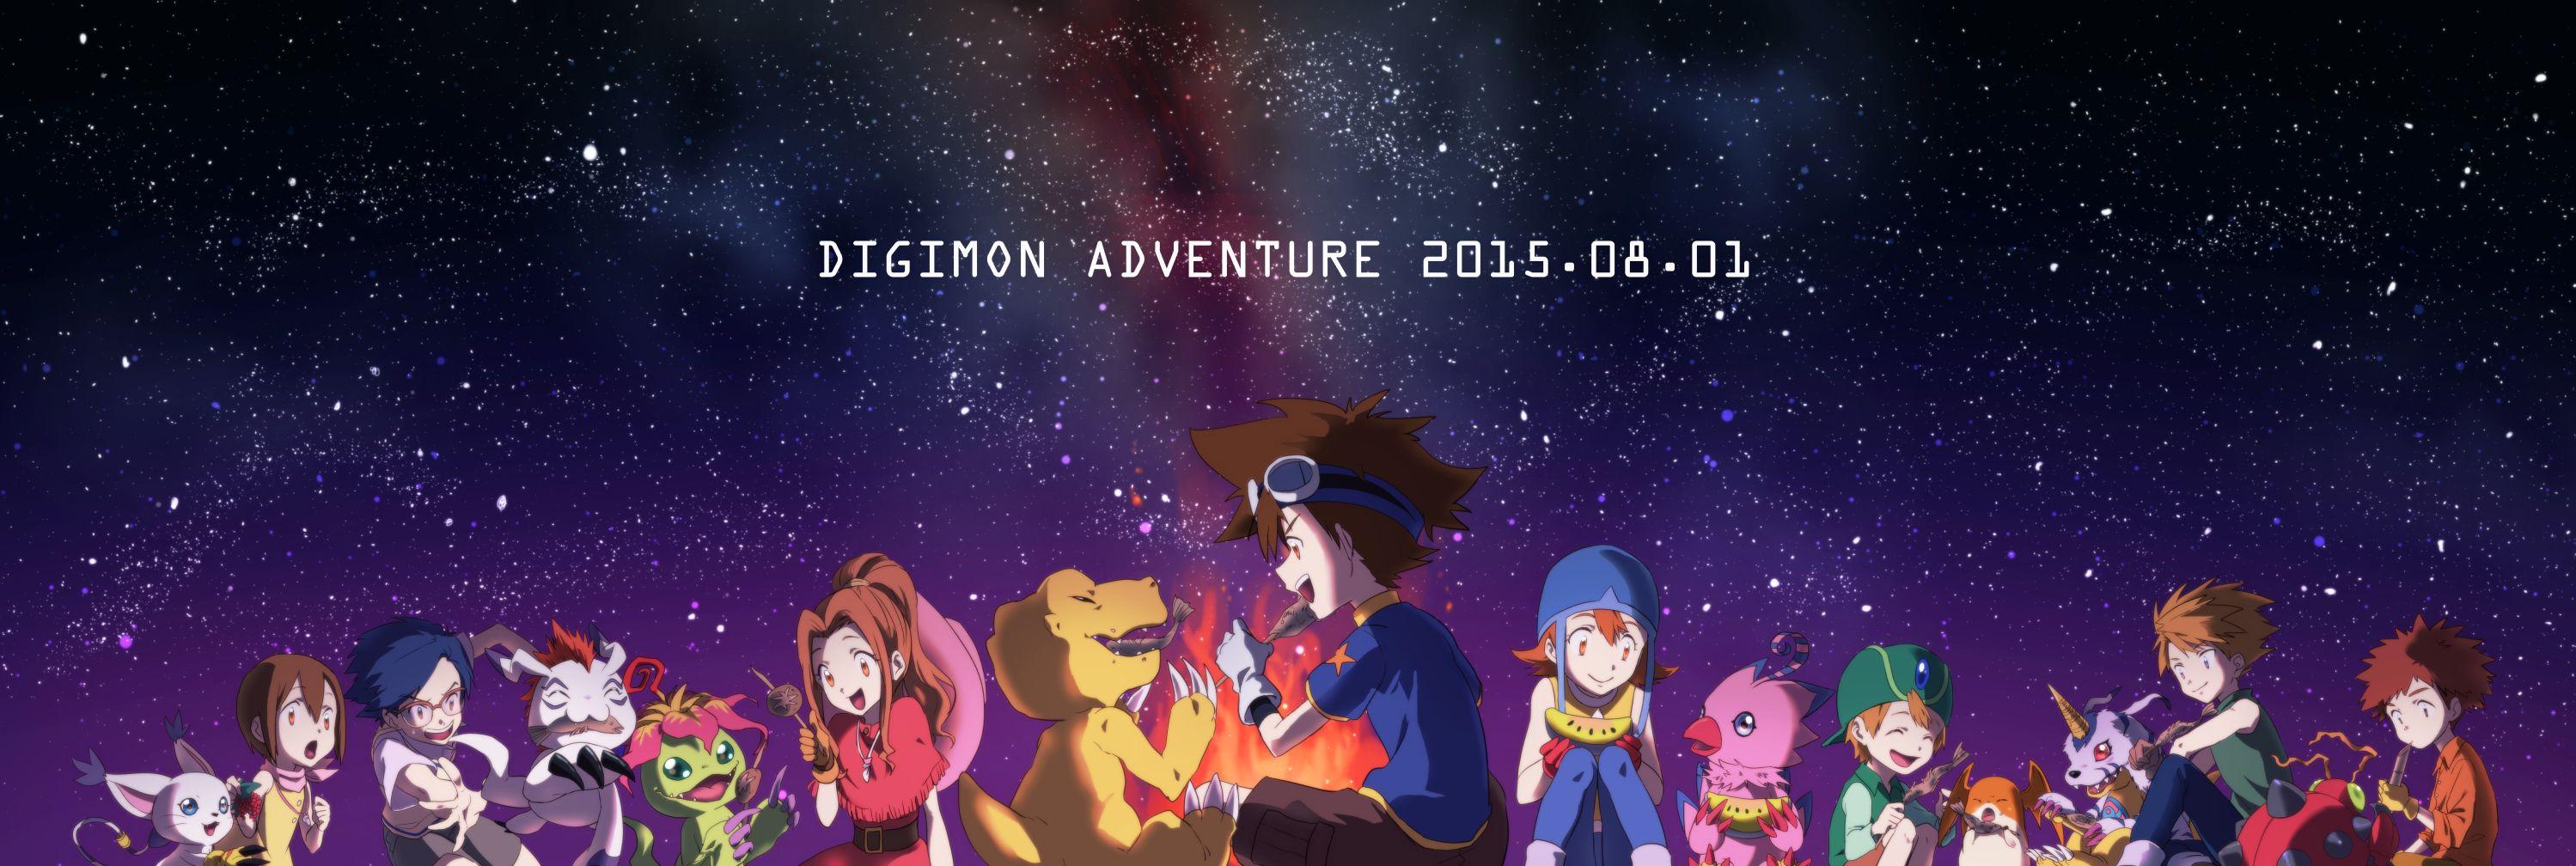 Digimon Adventure/1907918 Zerochan Digimon, Digimon